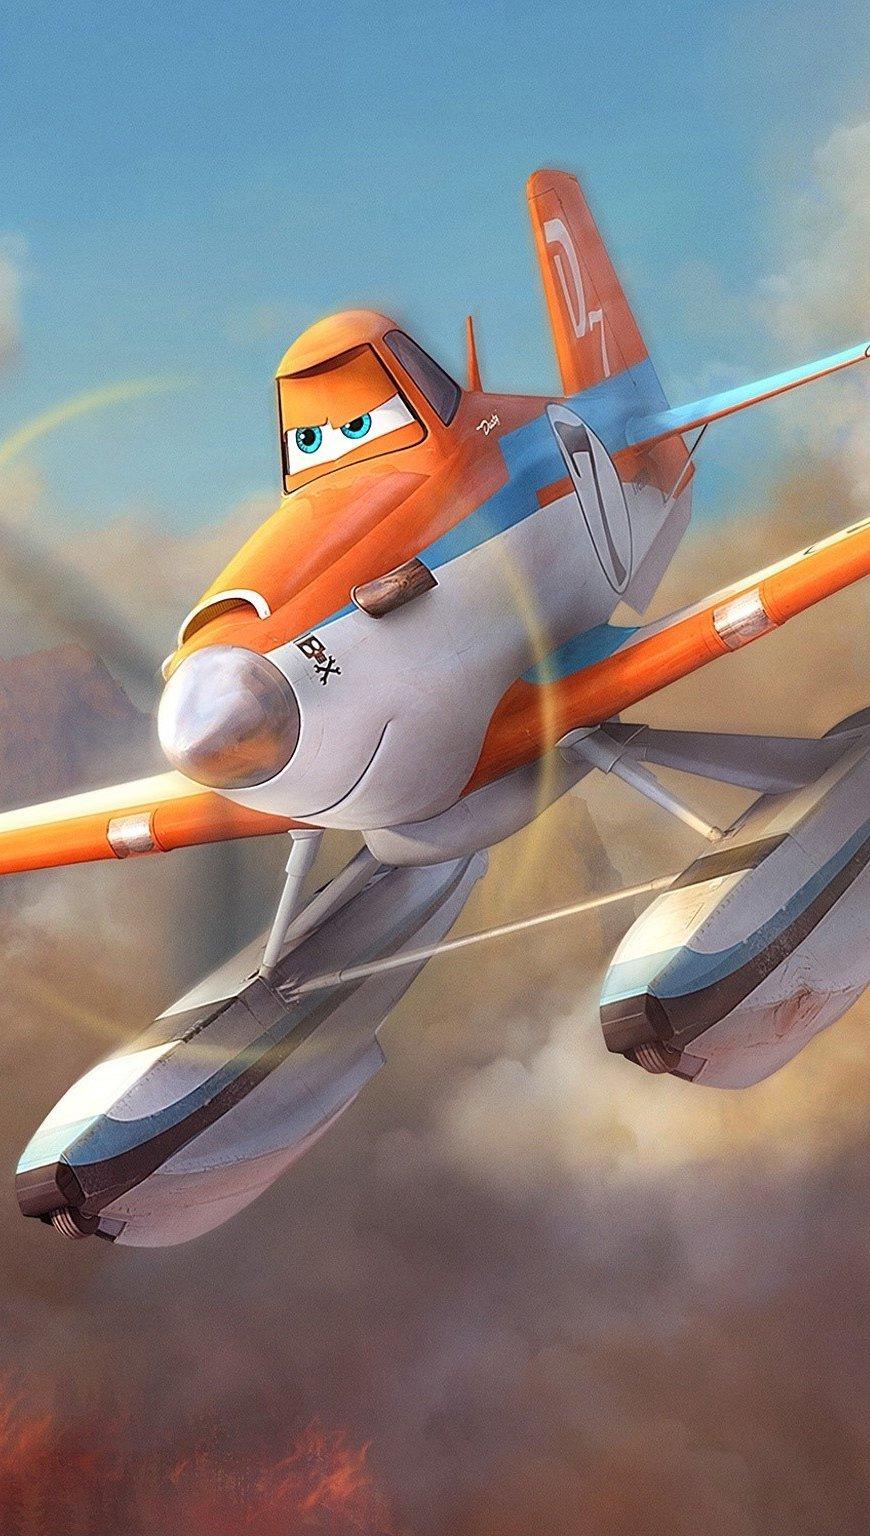 Wallpaper Aircraft: Rescue team Vertical